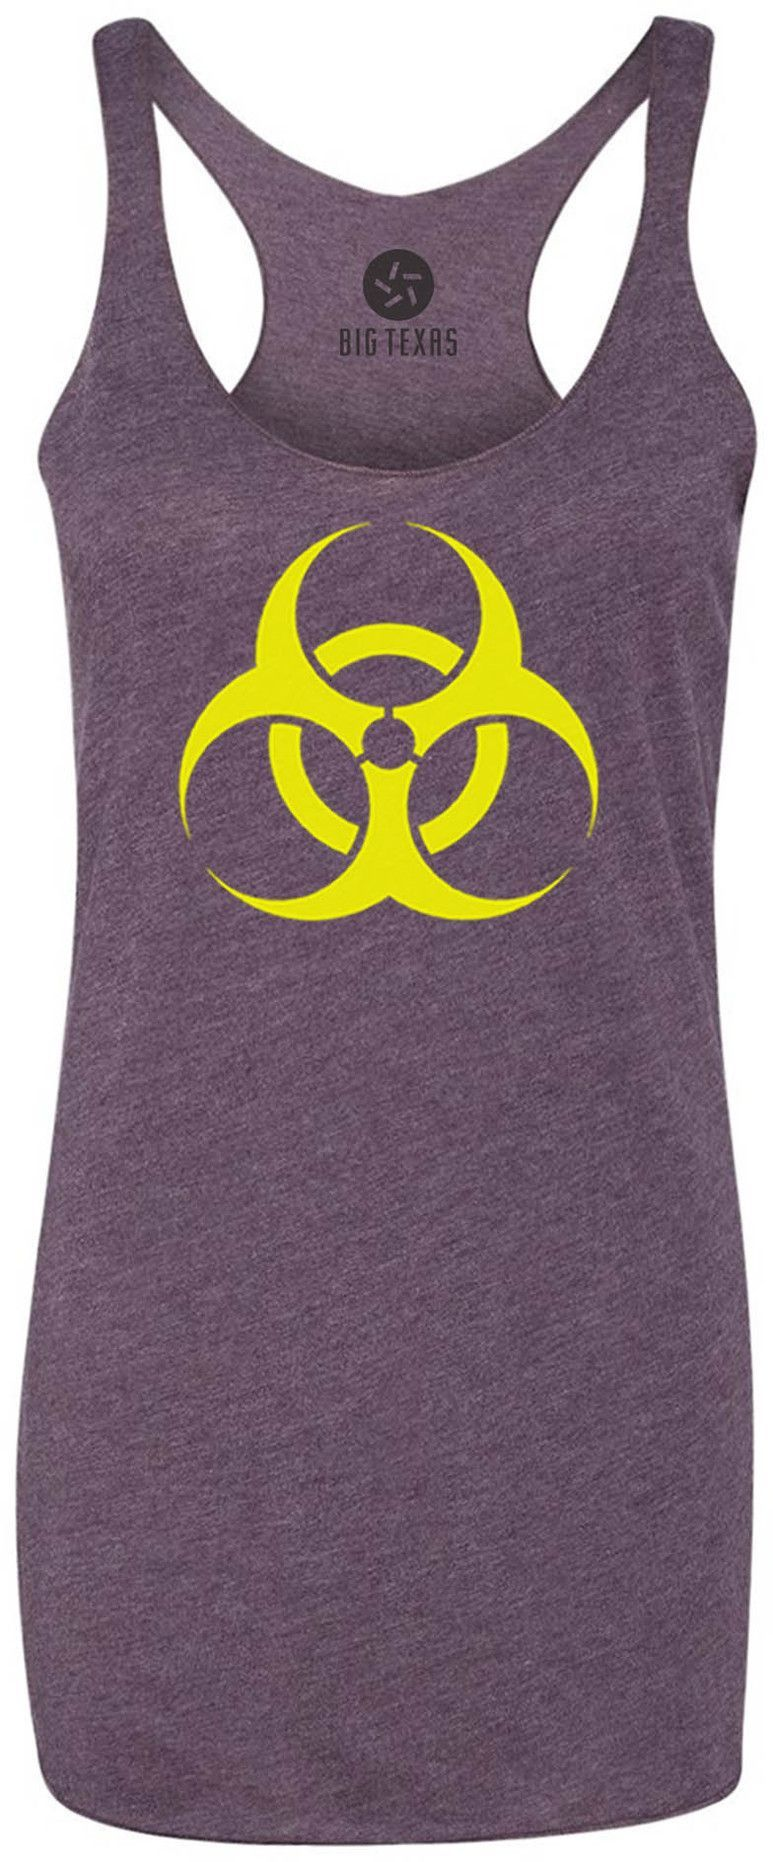 BioHazard (Yellow) Tri-Blend Racerback Tank-Top